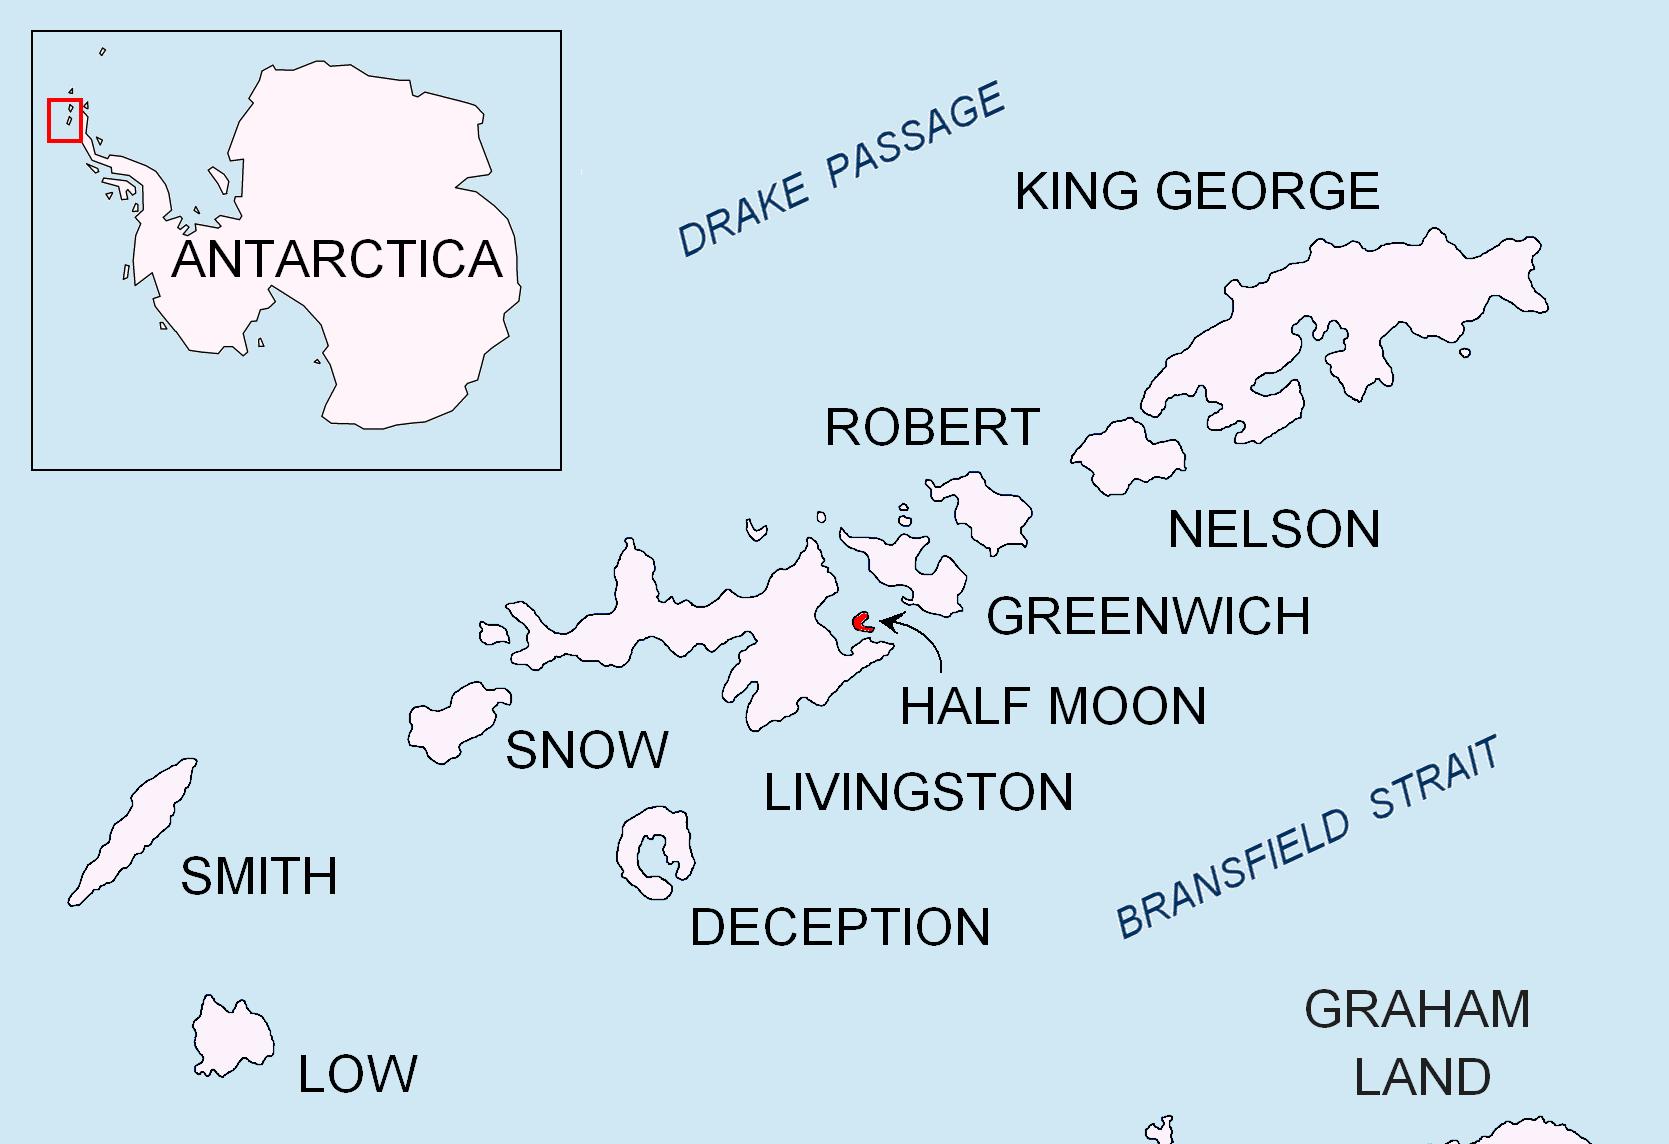 Mappa dell'isola Mezza Luna (Half Moon) - isole Shetland meridionali